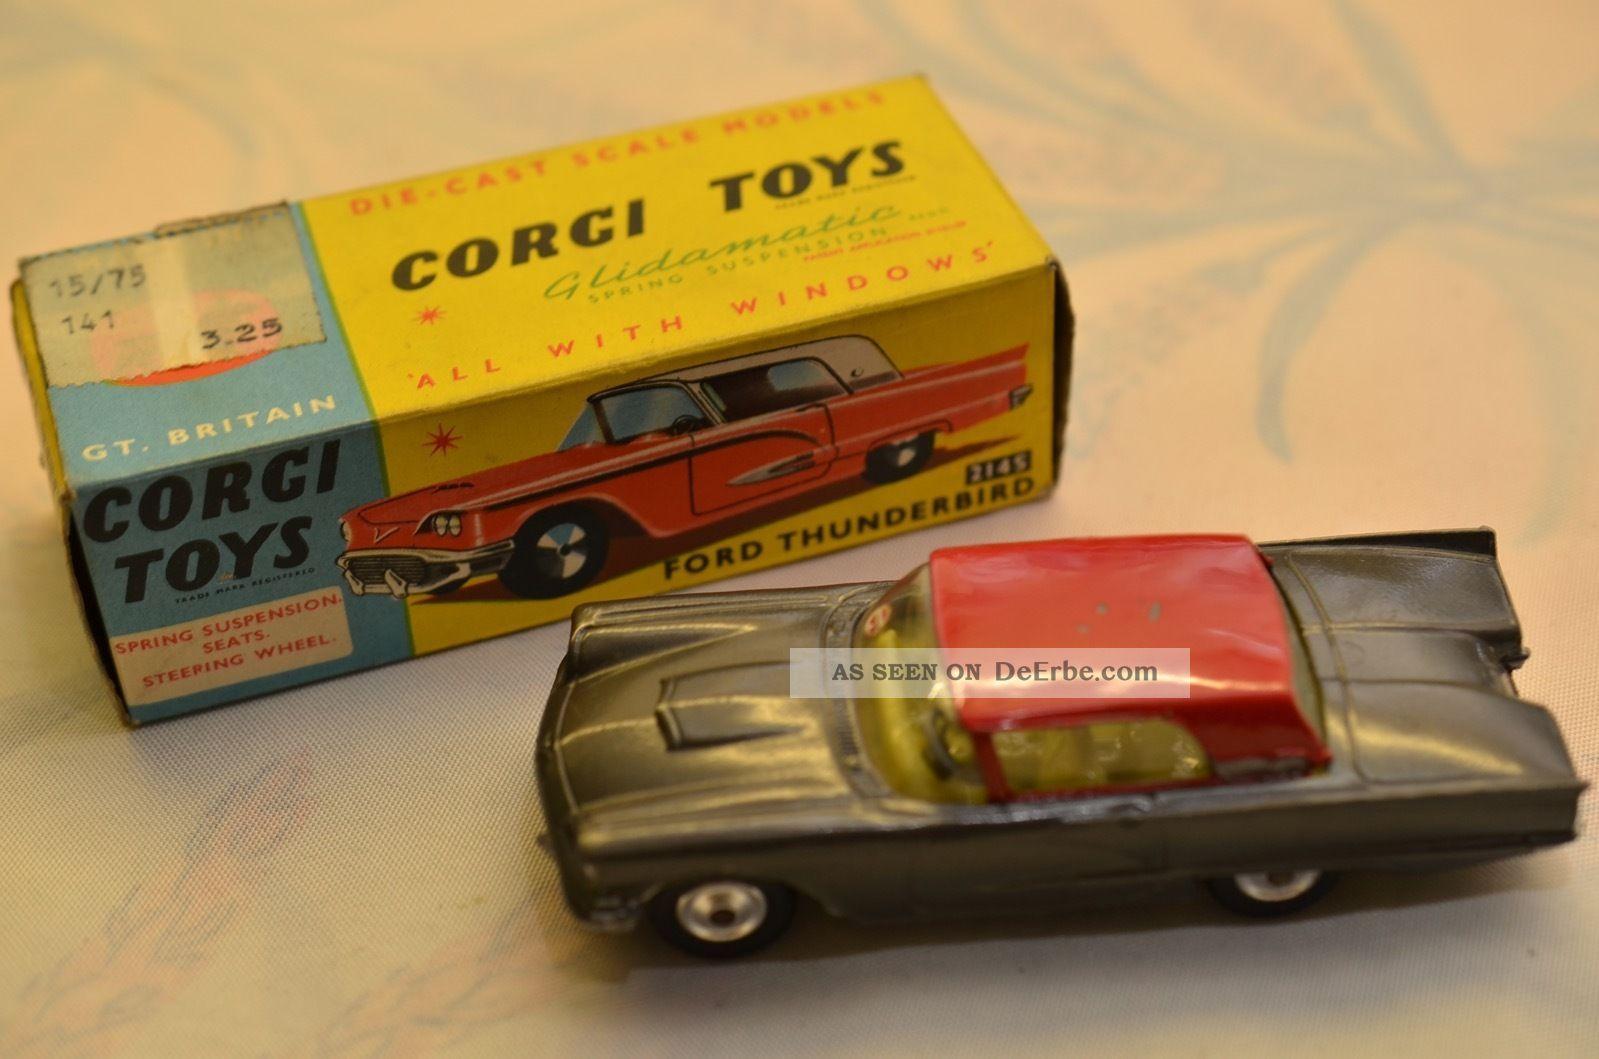 Sammlerstück Corgi Toys 214s Ford Thunderbird Fahrzeuge Bild